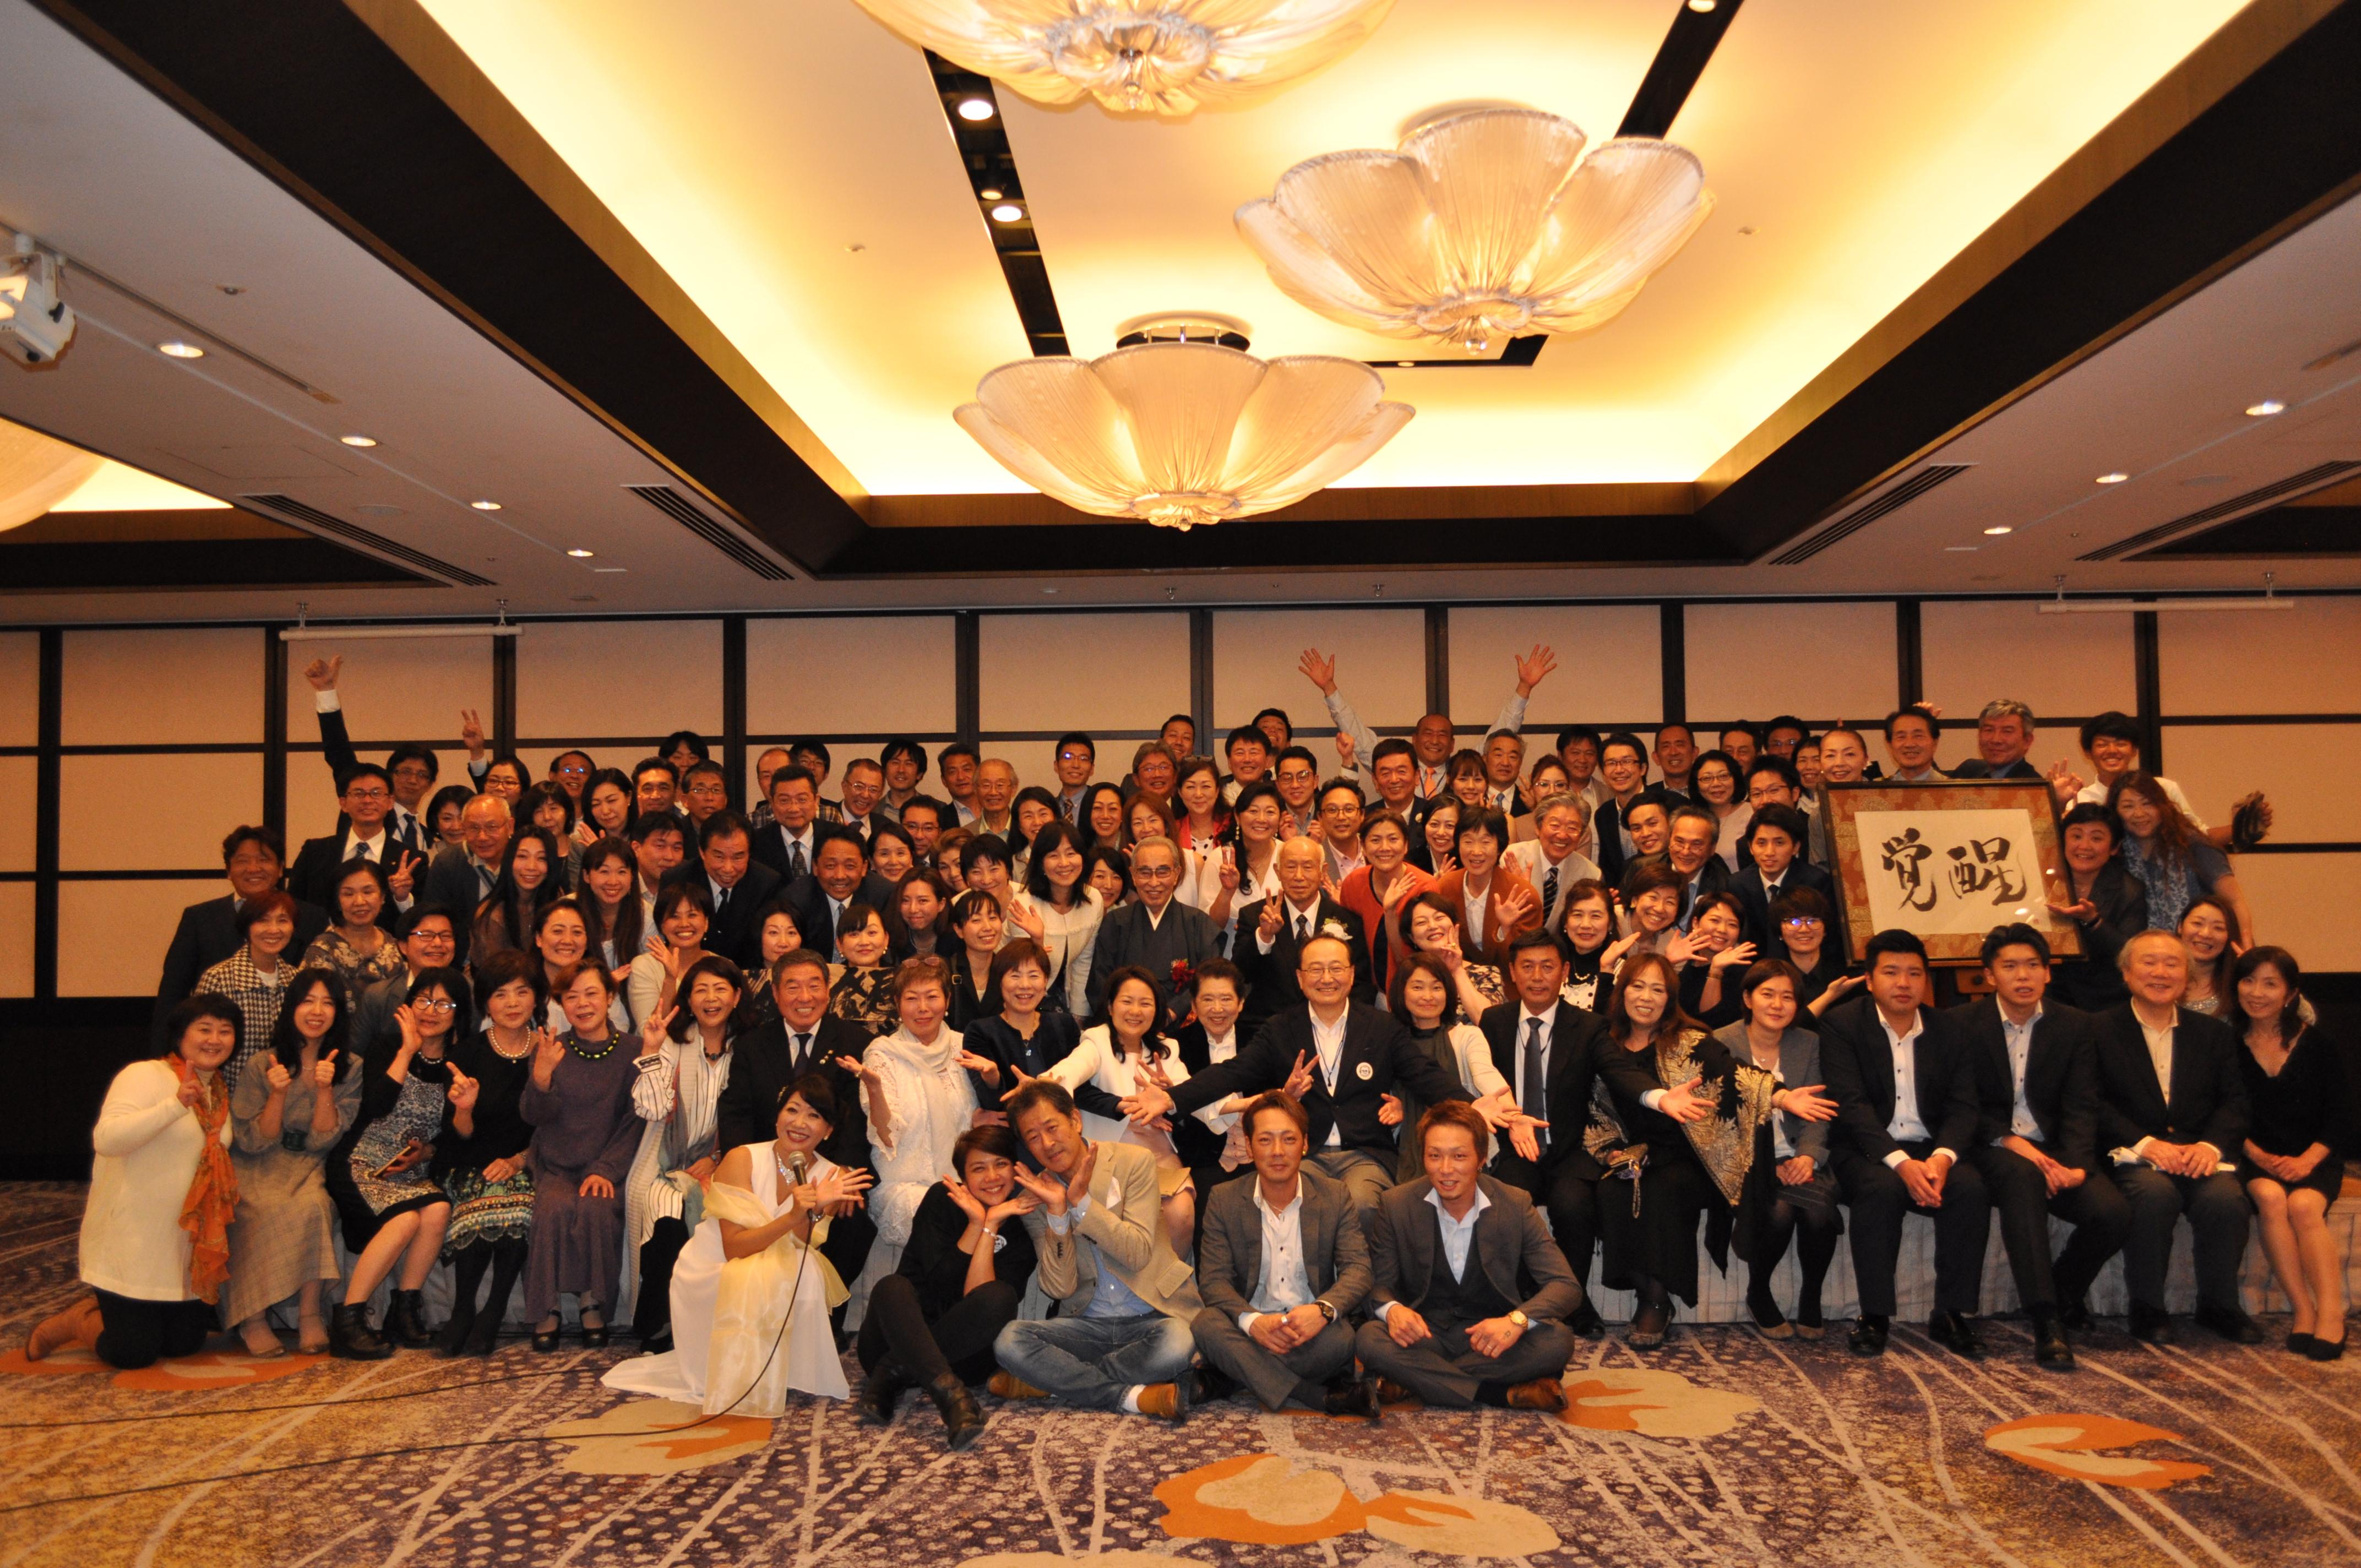 DSC 0607 - 第6回思風会全国大会2018in東京開催